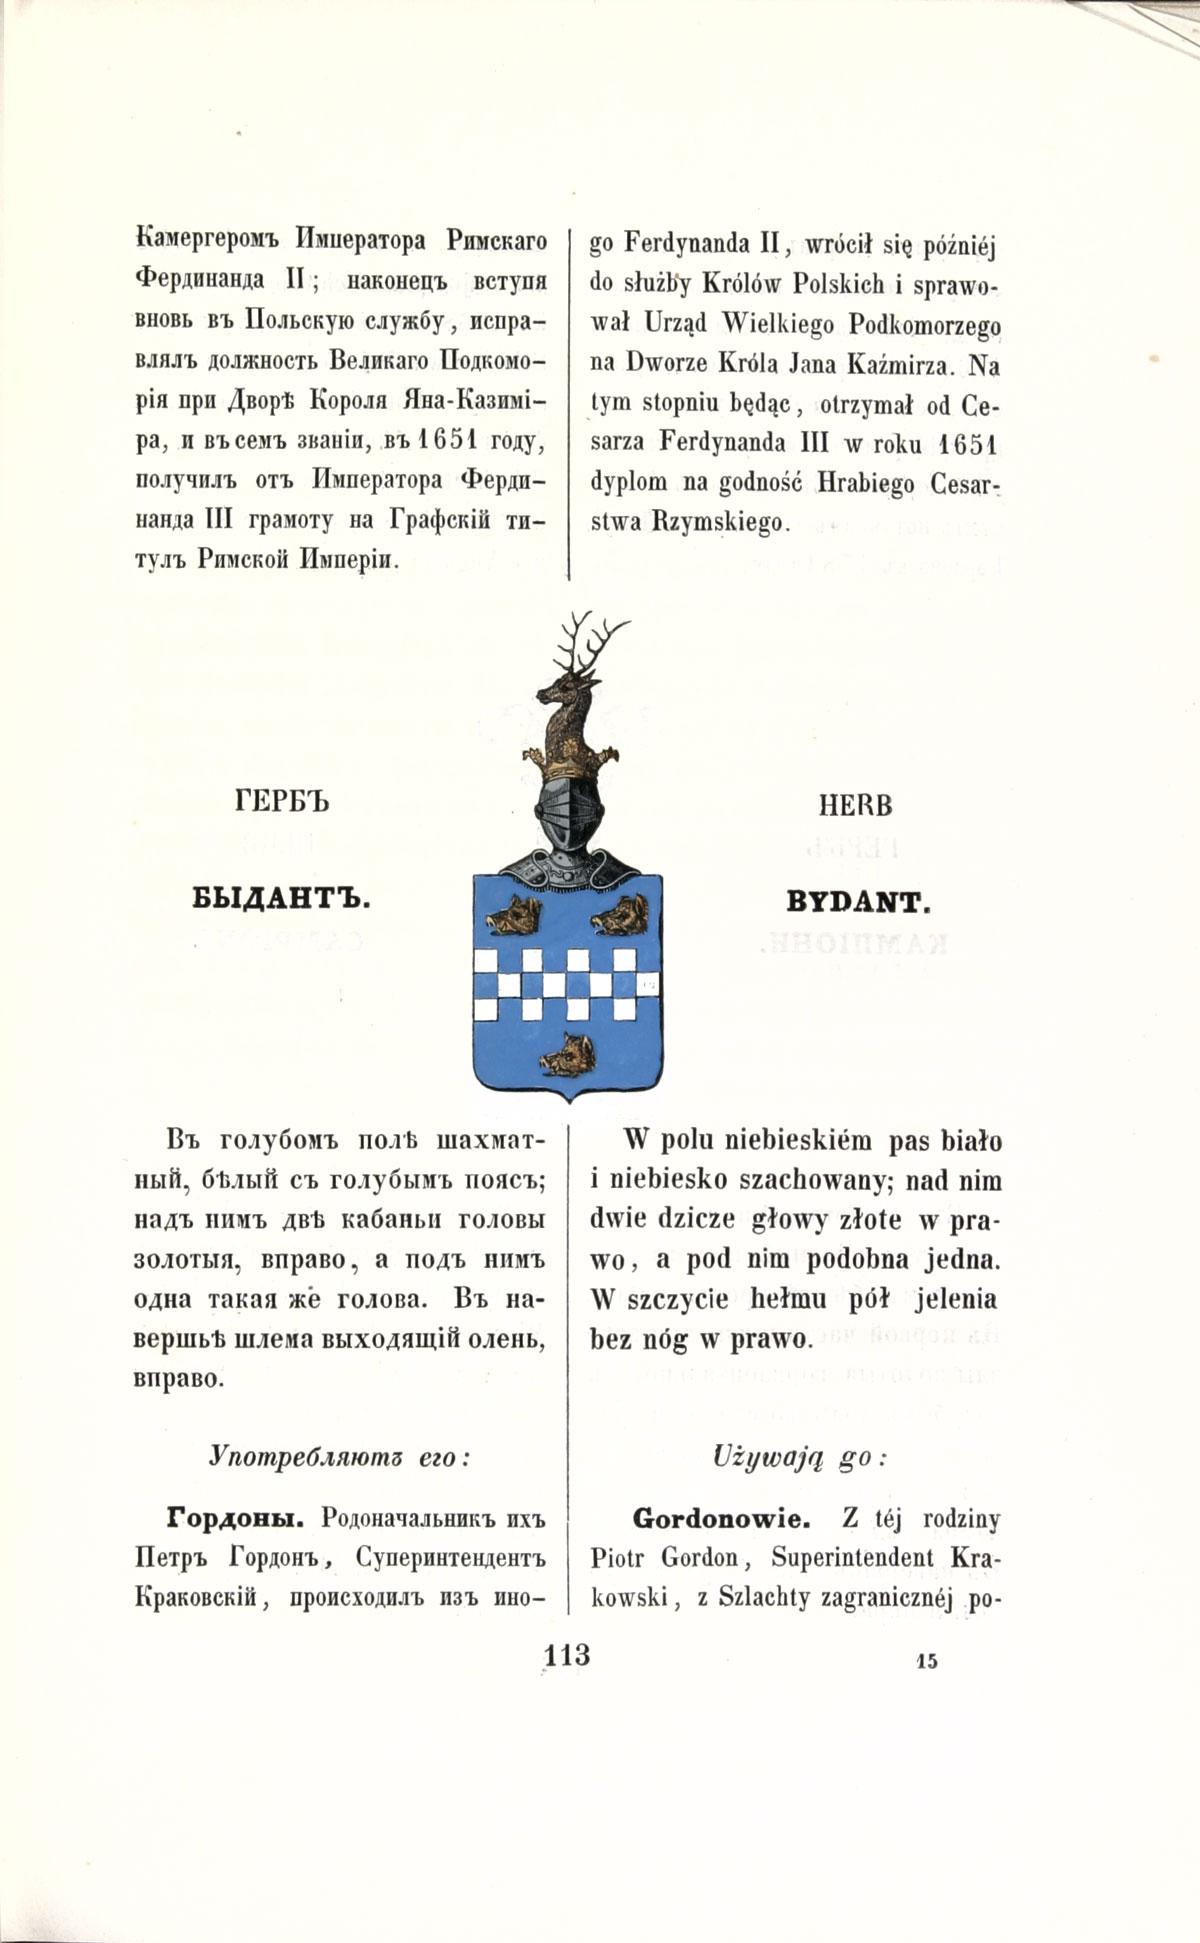 Герб Быдант, стр. 1